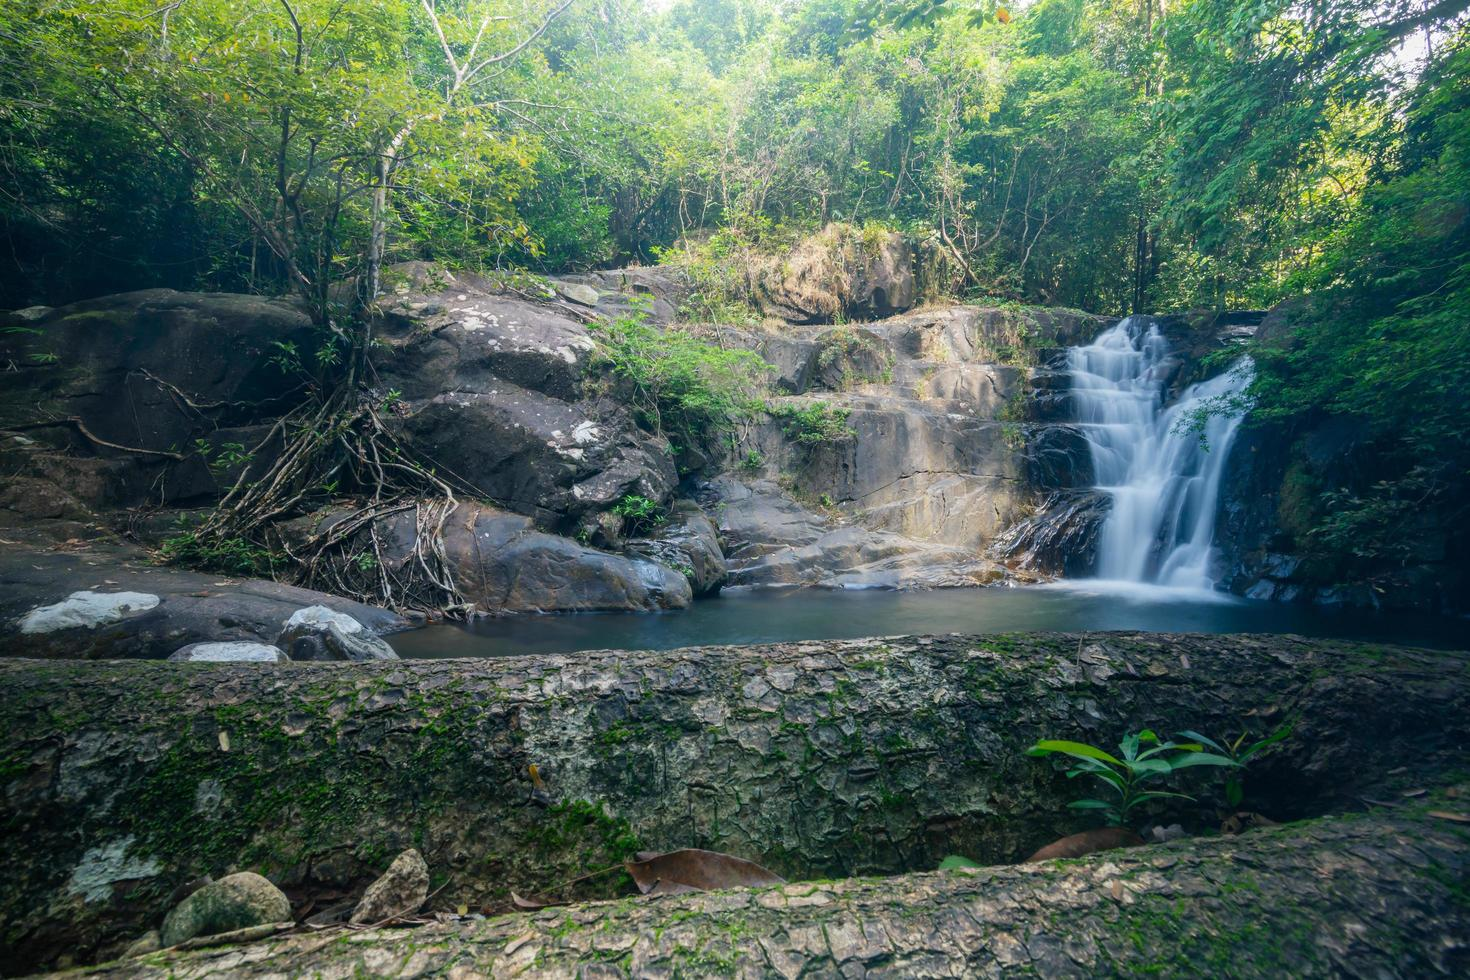 cascate di khlong pla kang in thailandia foto